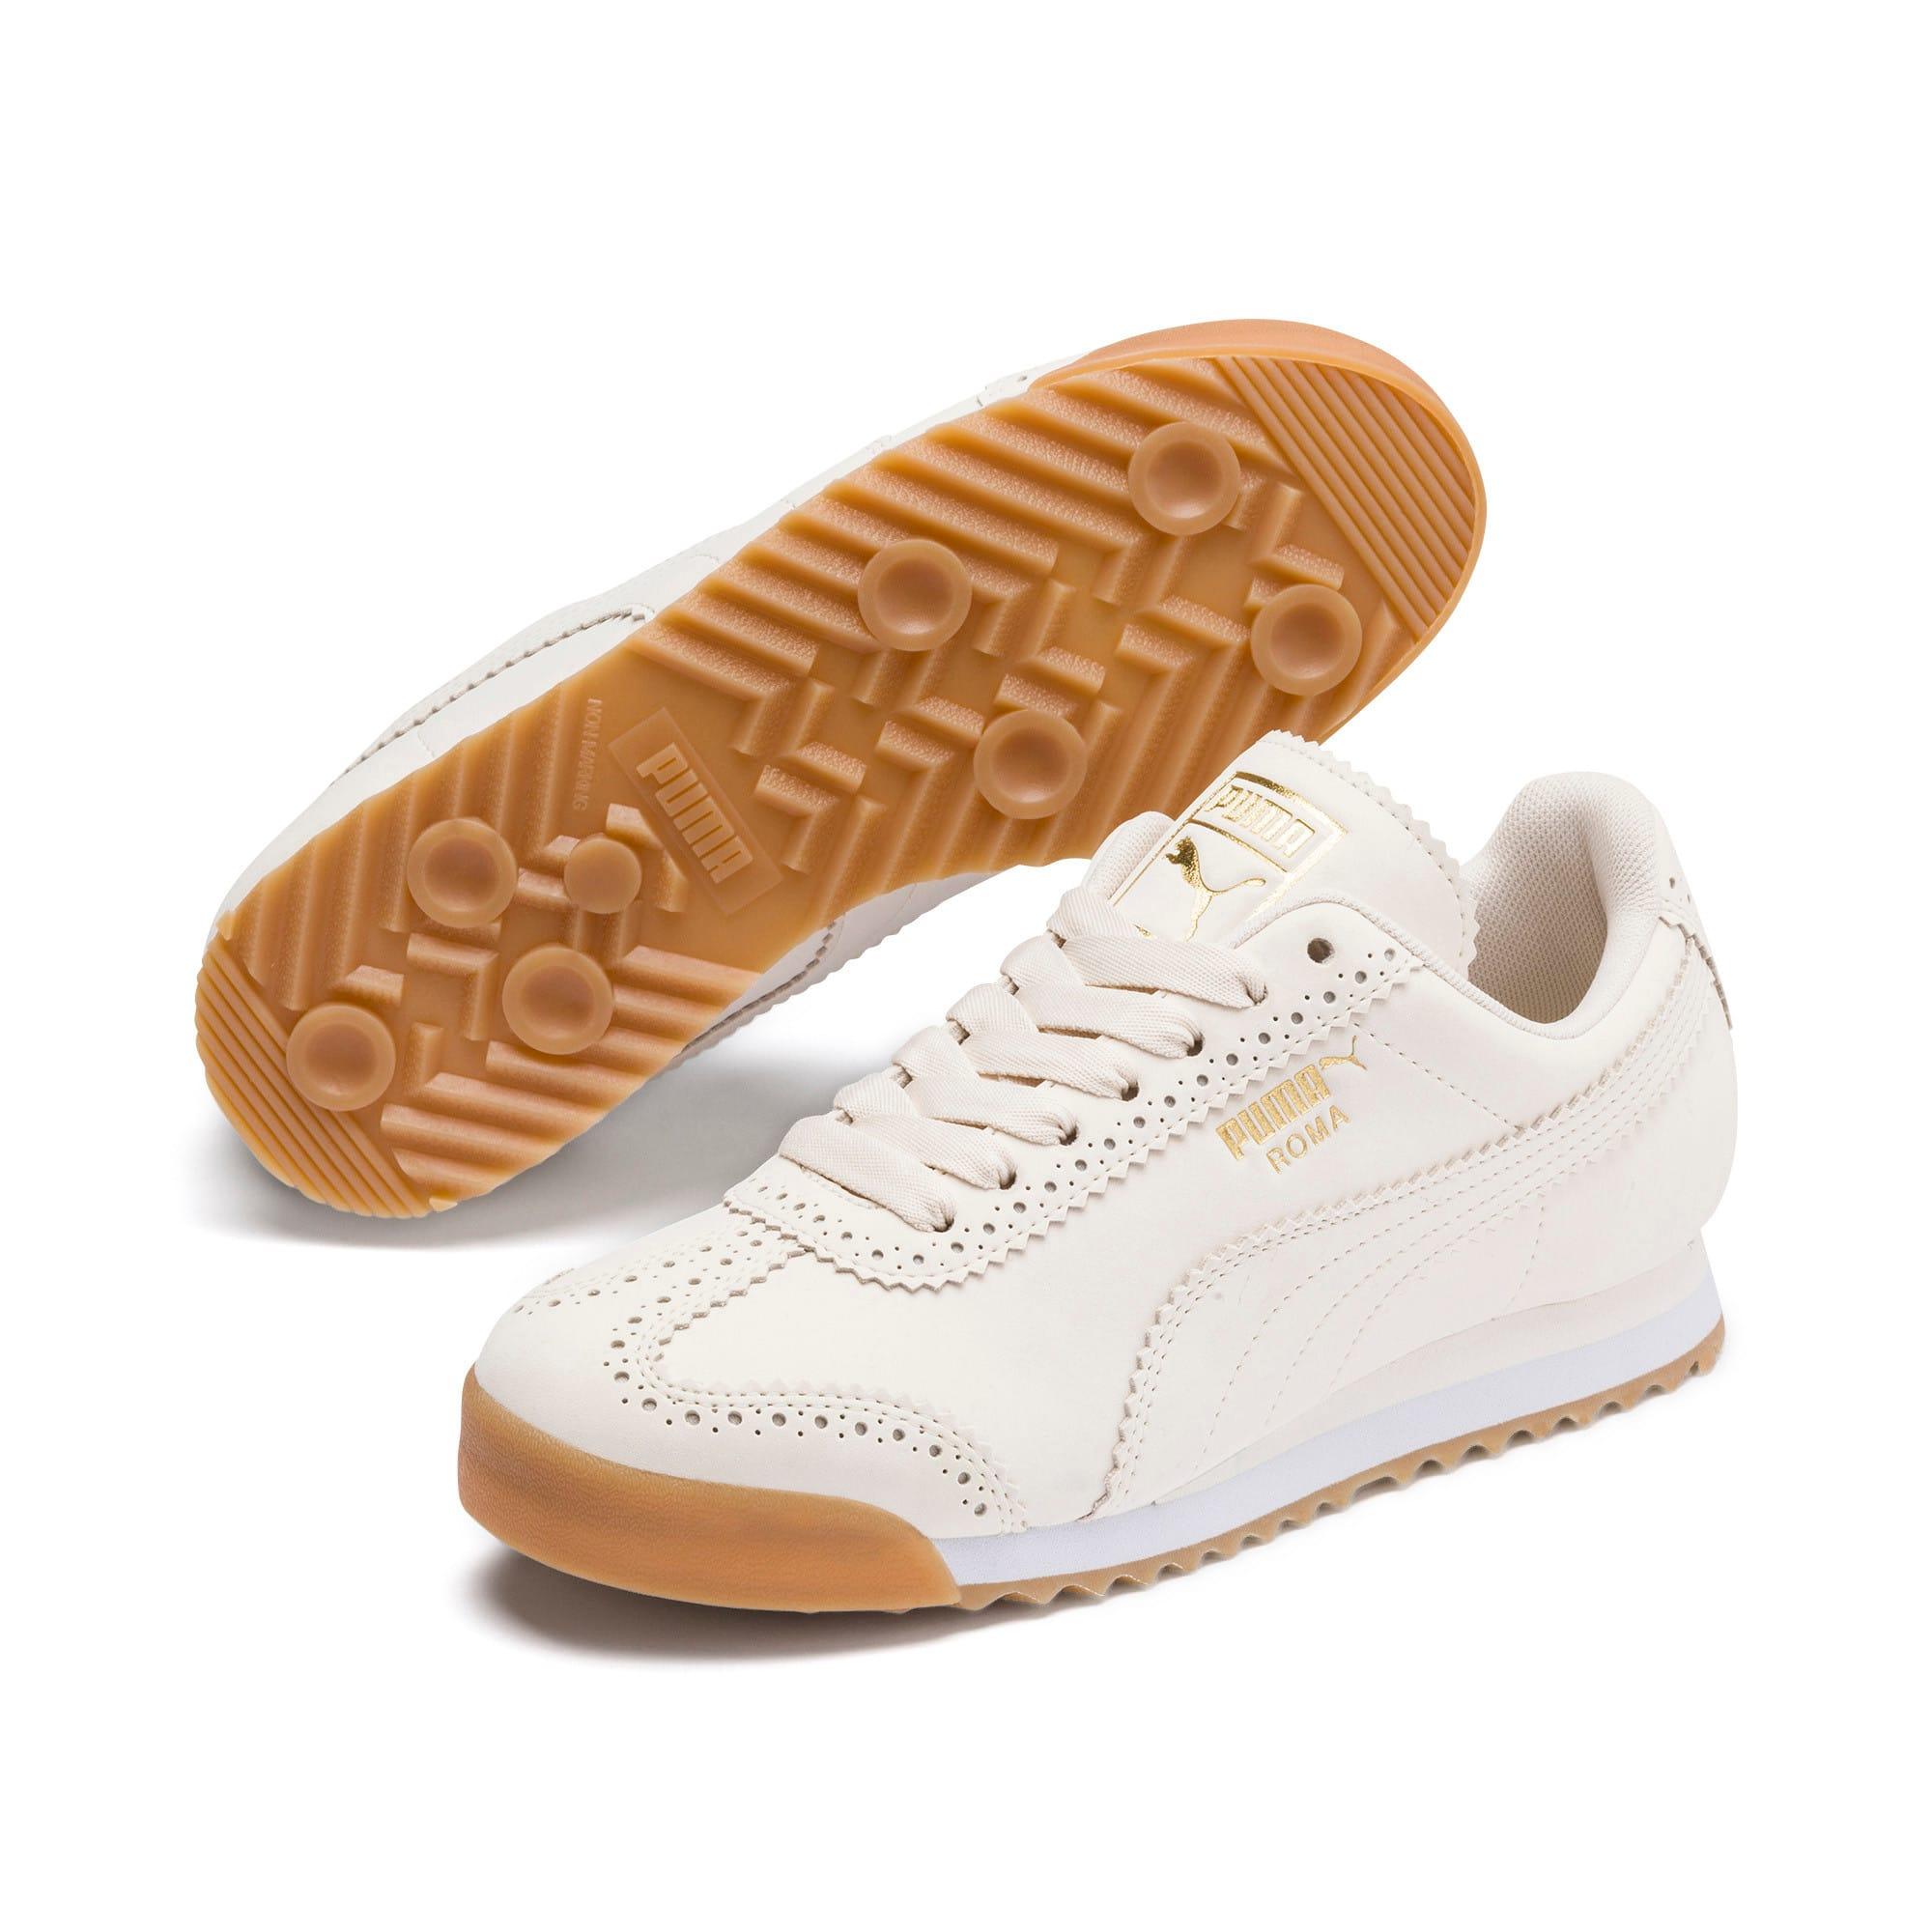 Miniatura 2 de Zapatos deportivos Roma Brogue para mujer, Pastel Parchment-P.Team Gold, mediano